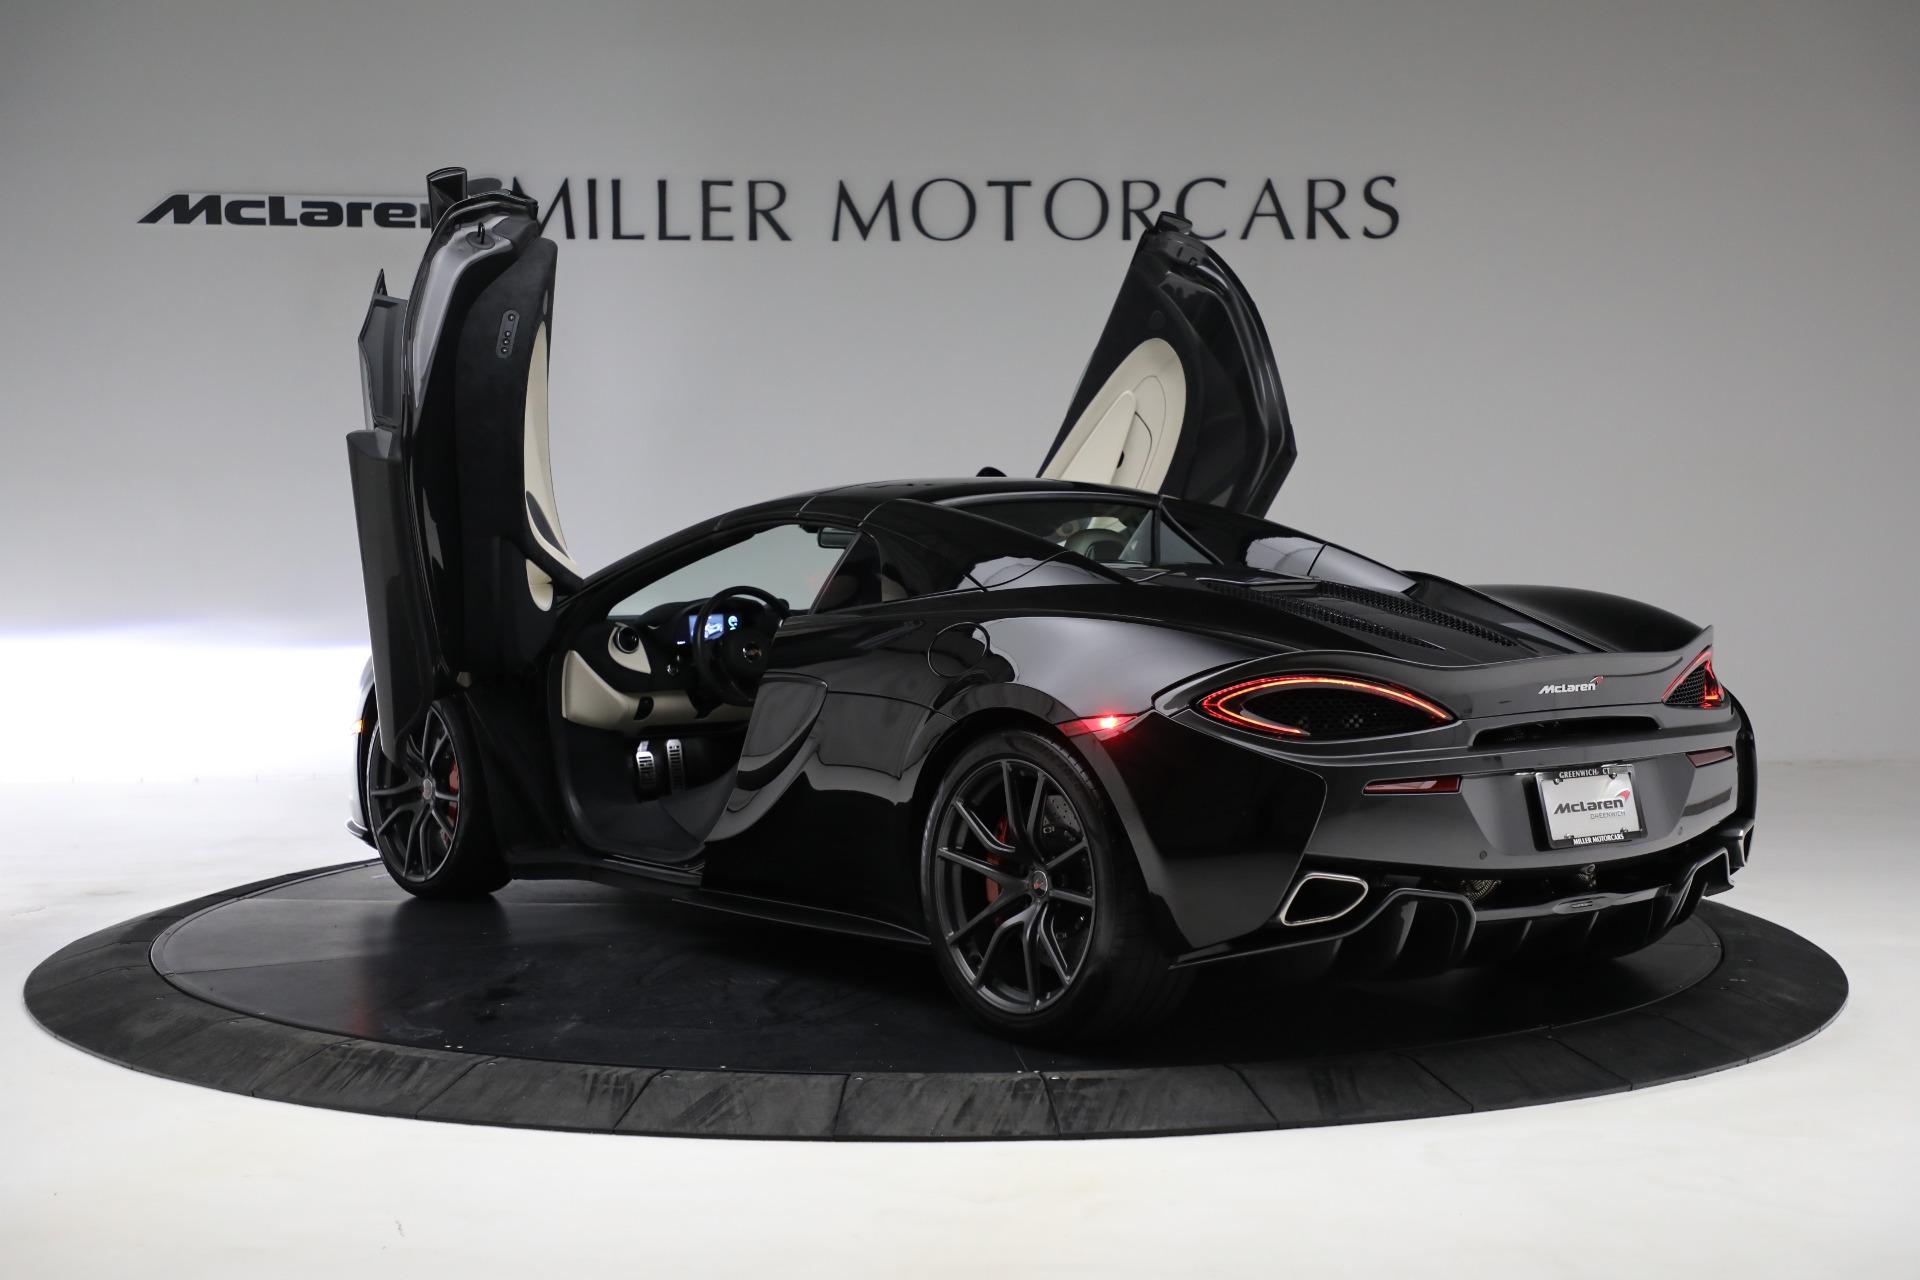 New 2018 McLaren 570S Spider For Sale In Greenwich, CT 2312_p24